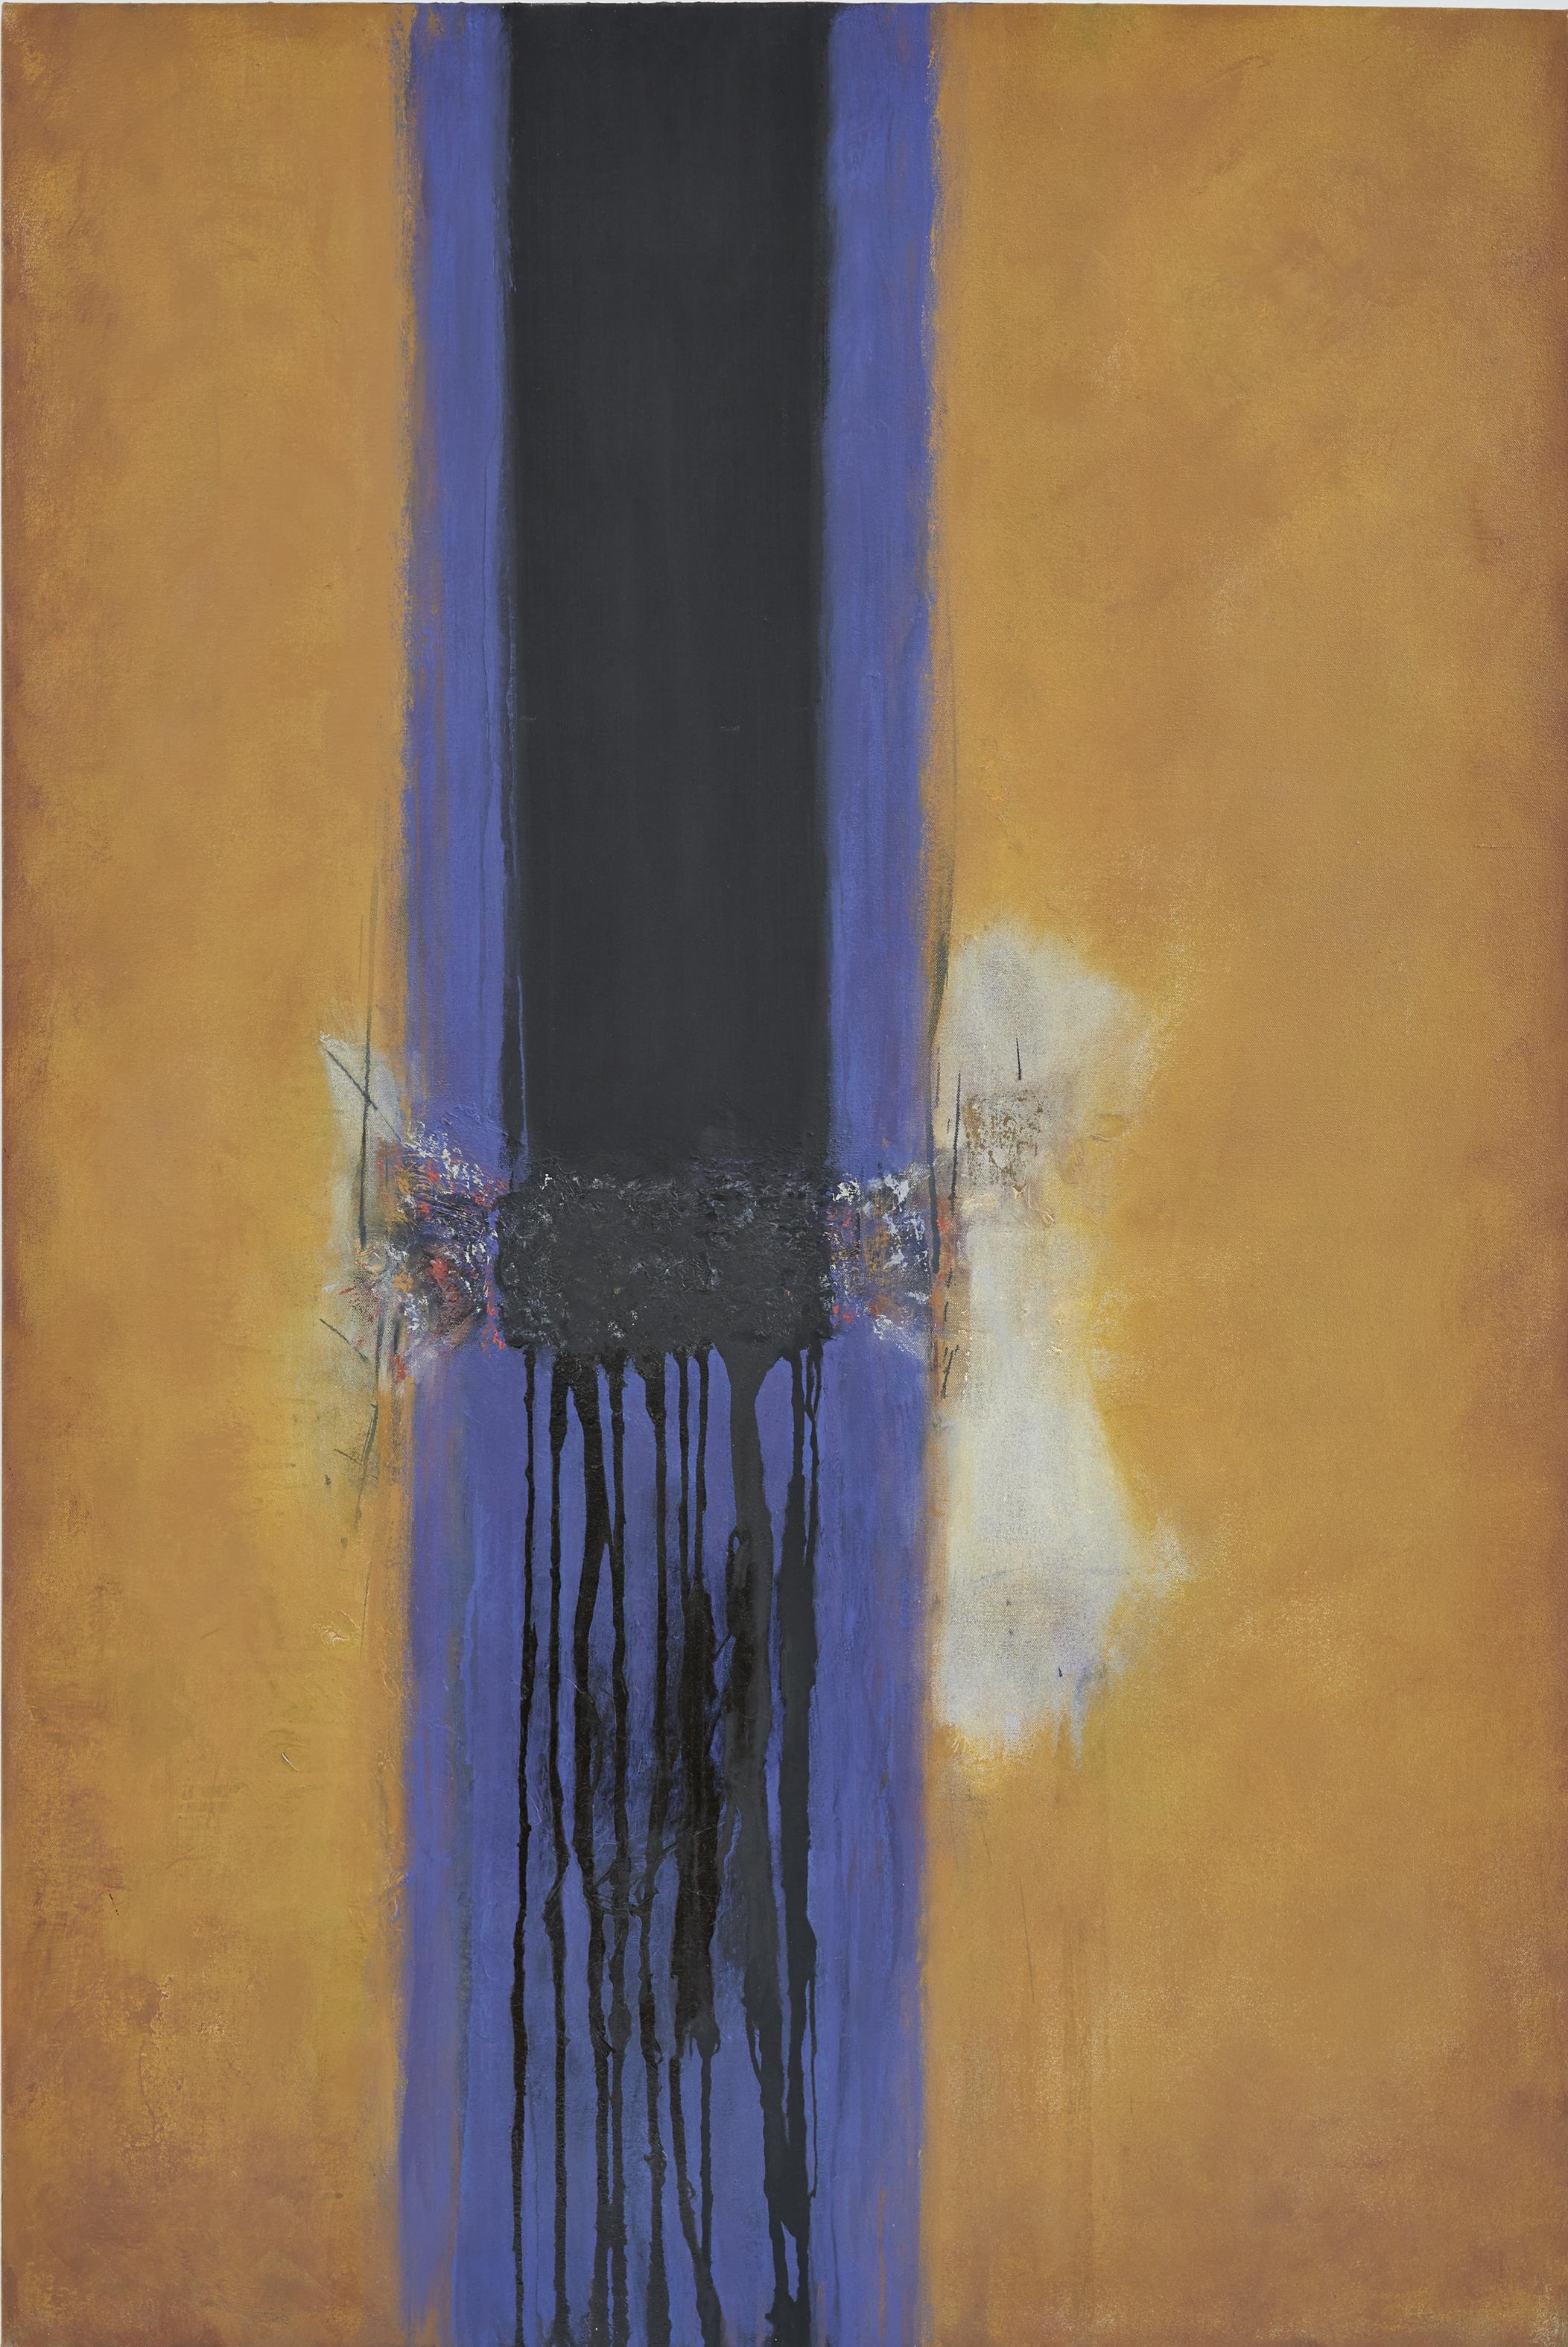 Untitled (Yellow & Blue)